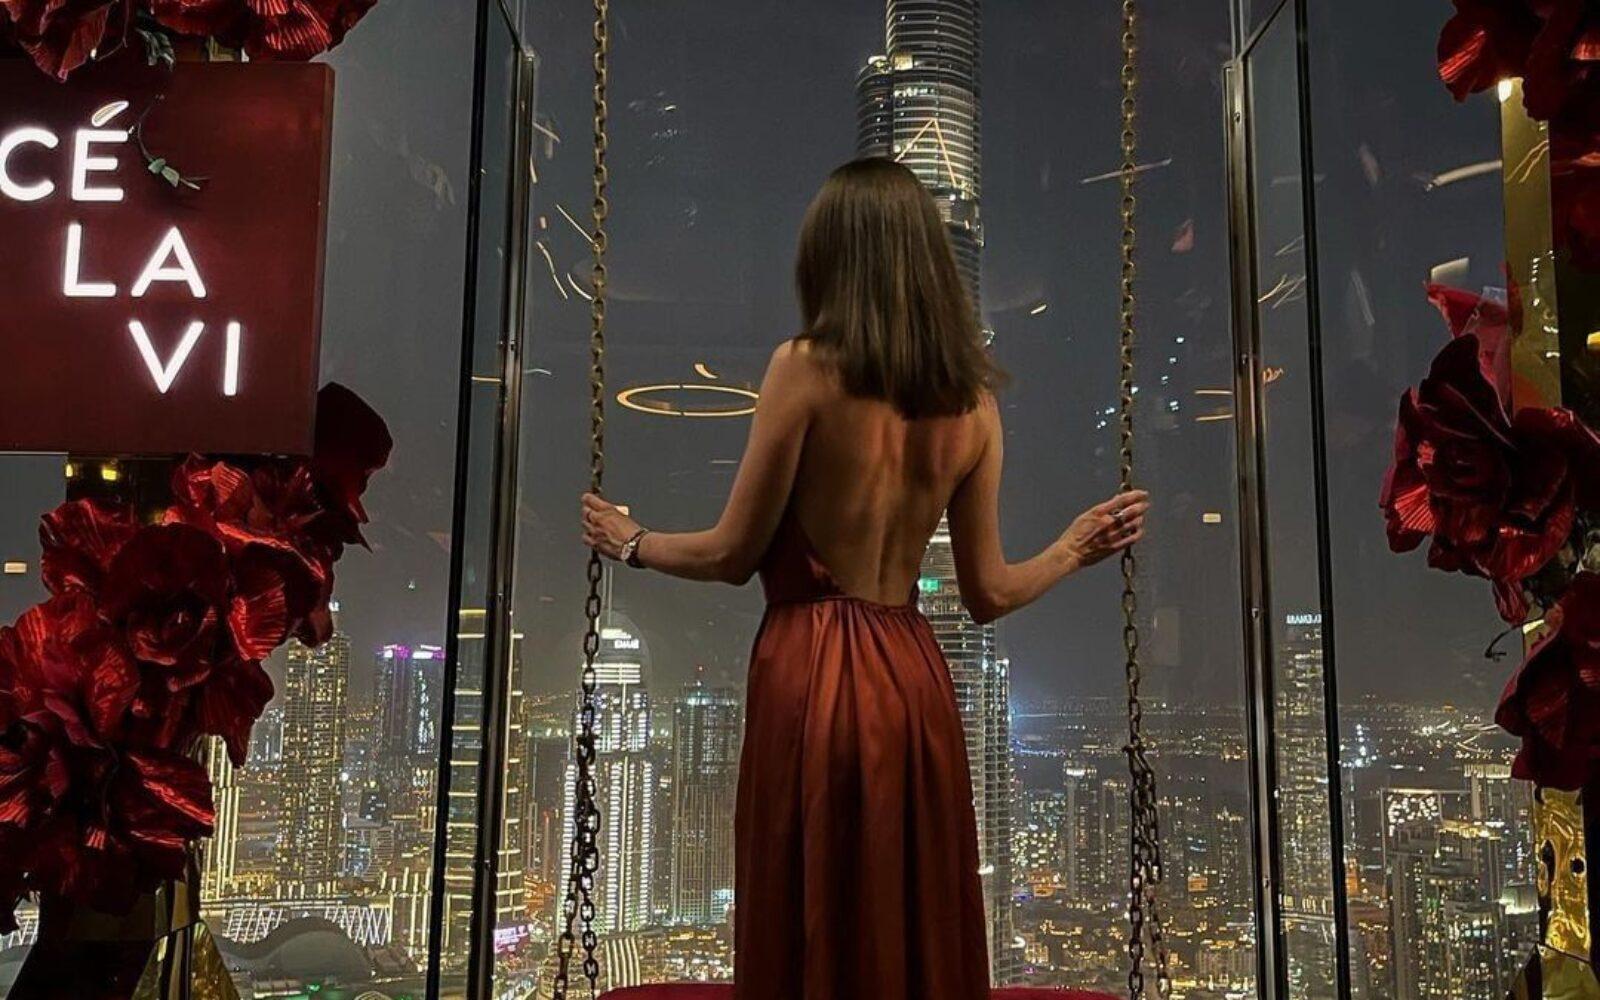 Ce La Vi, Address Sky View Dubai launches a vegan menu